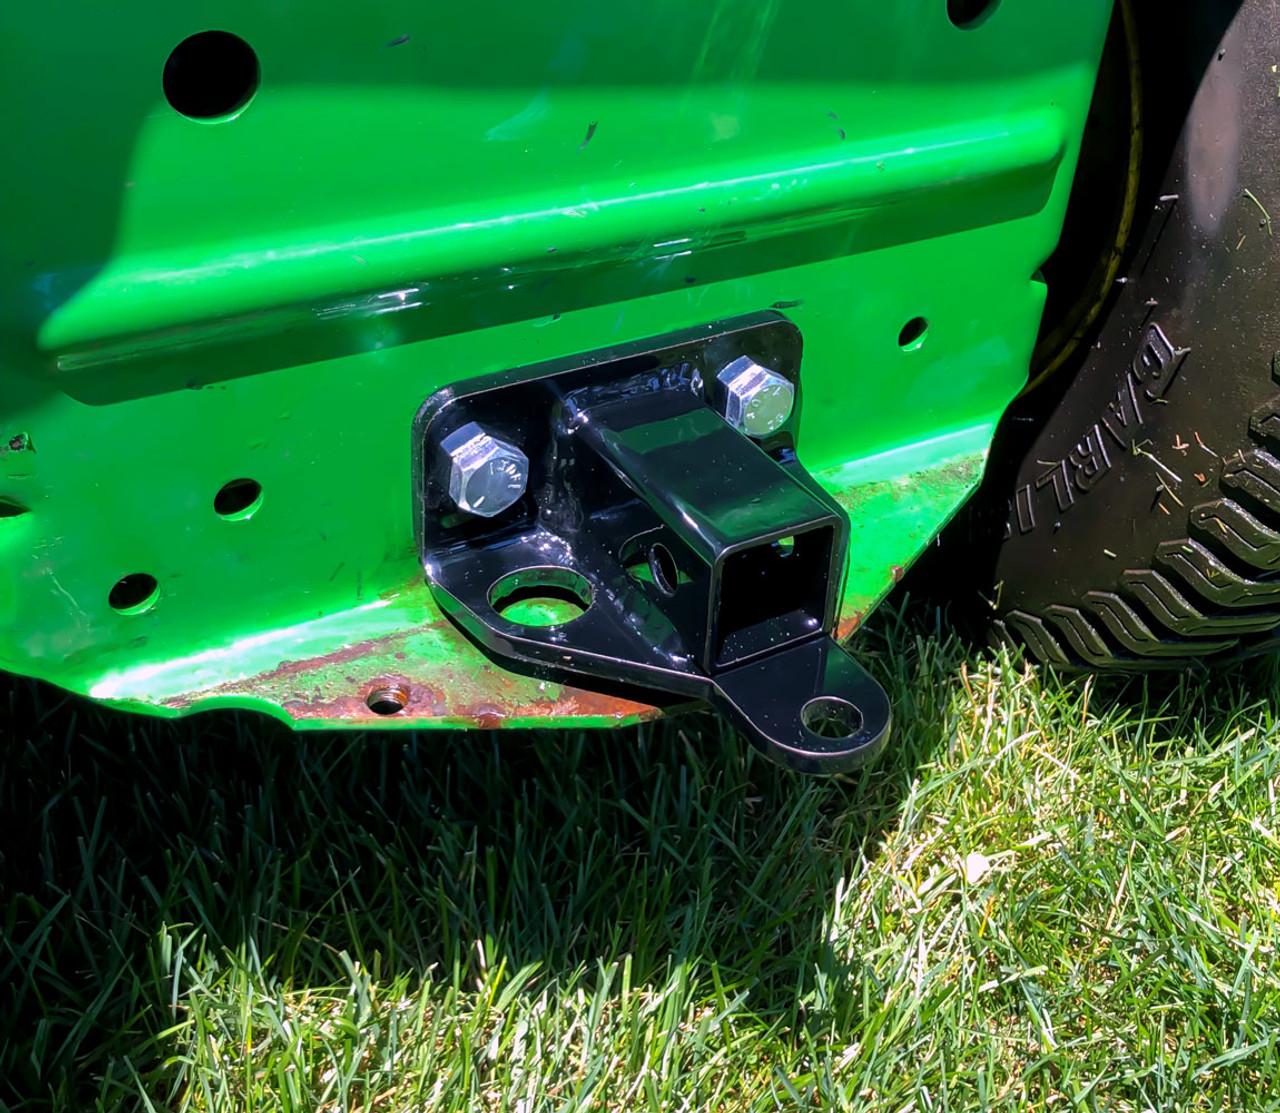 John Deere ZTR Hitch 1¼ inch receiver lawn mower trailer hitches